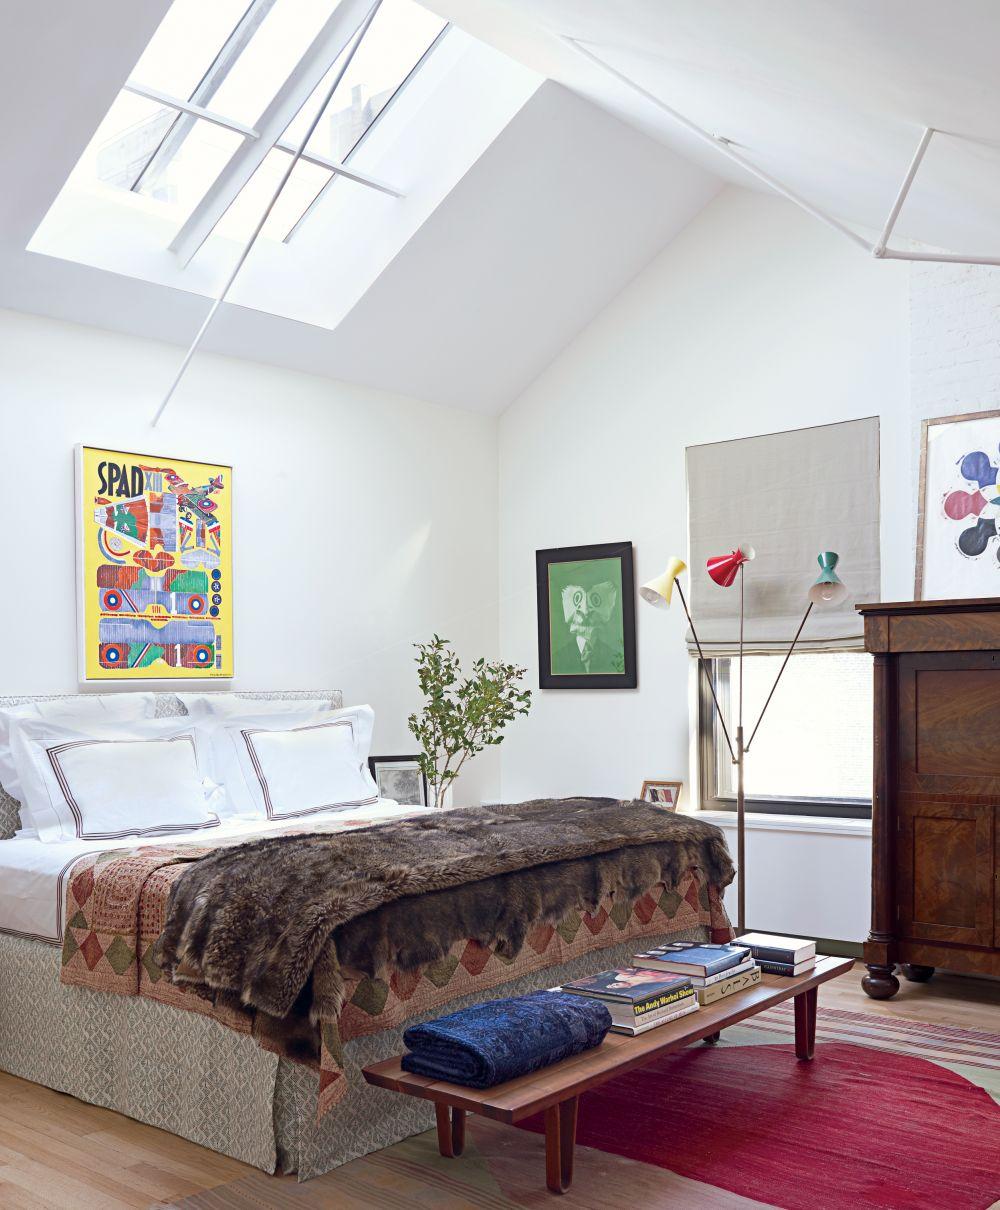 New York Bedroom Interior Design White Bedroom Cupboards Elegant Bedroom Colors Small Apartment Bedroom Design: Contemporary Bedroom By Milly De Cabrol Ltd. And Risteárd